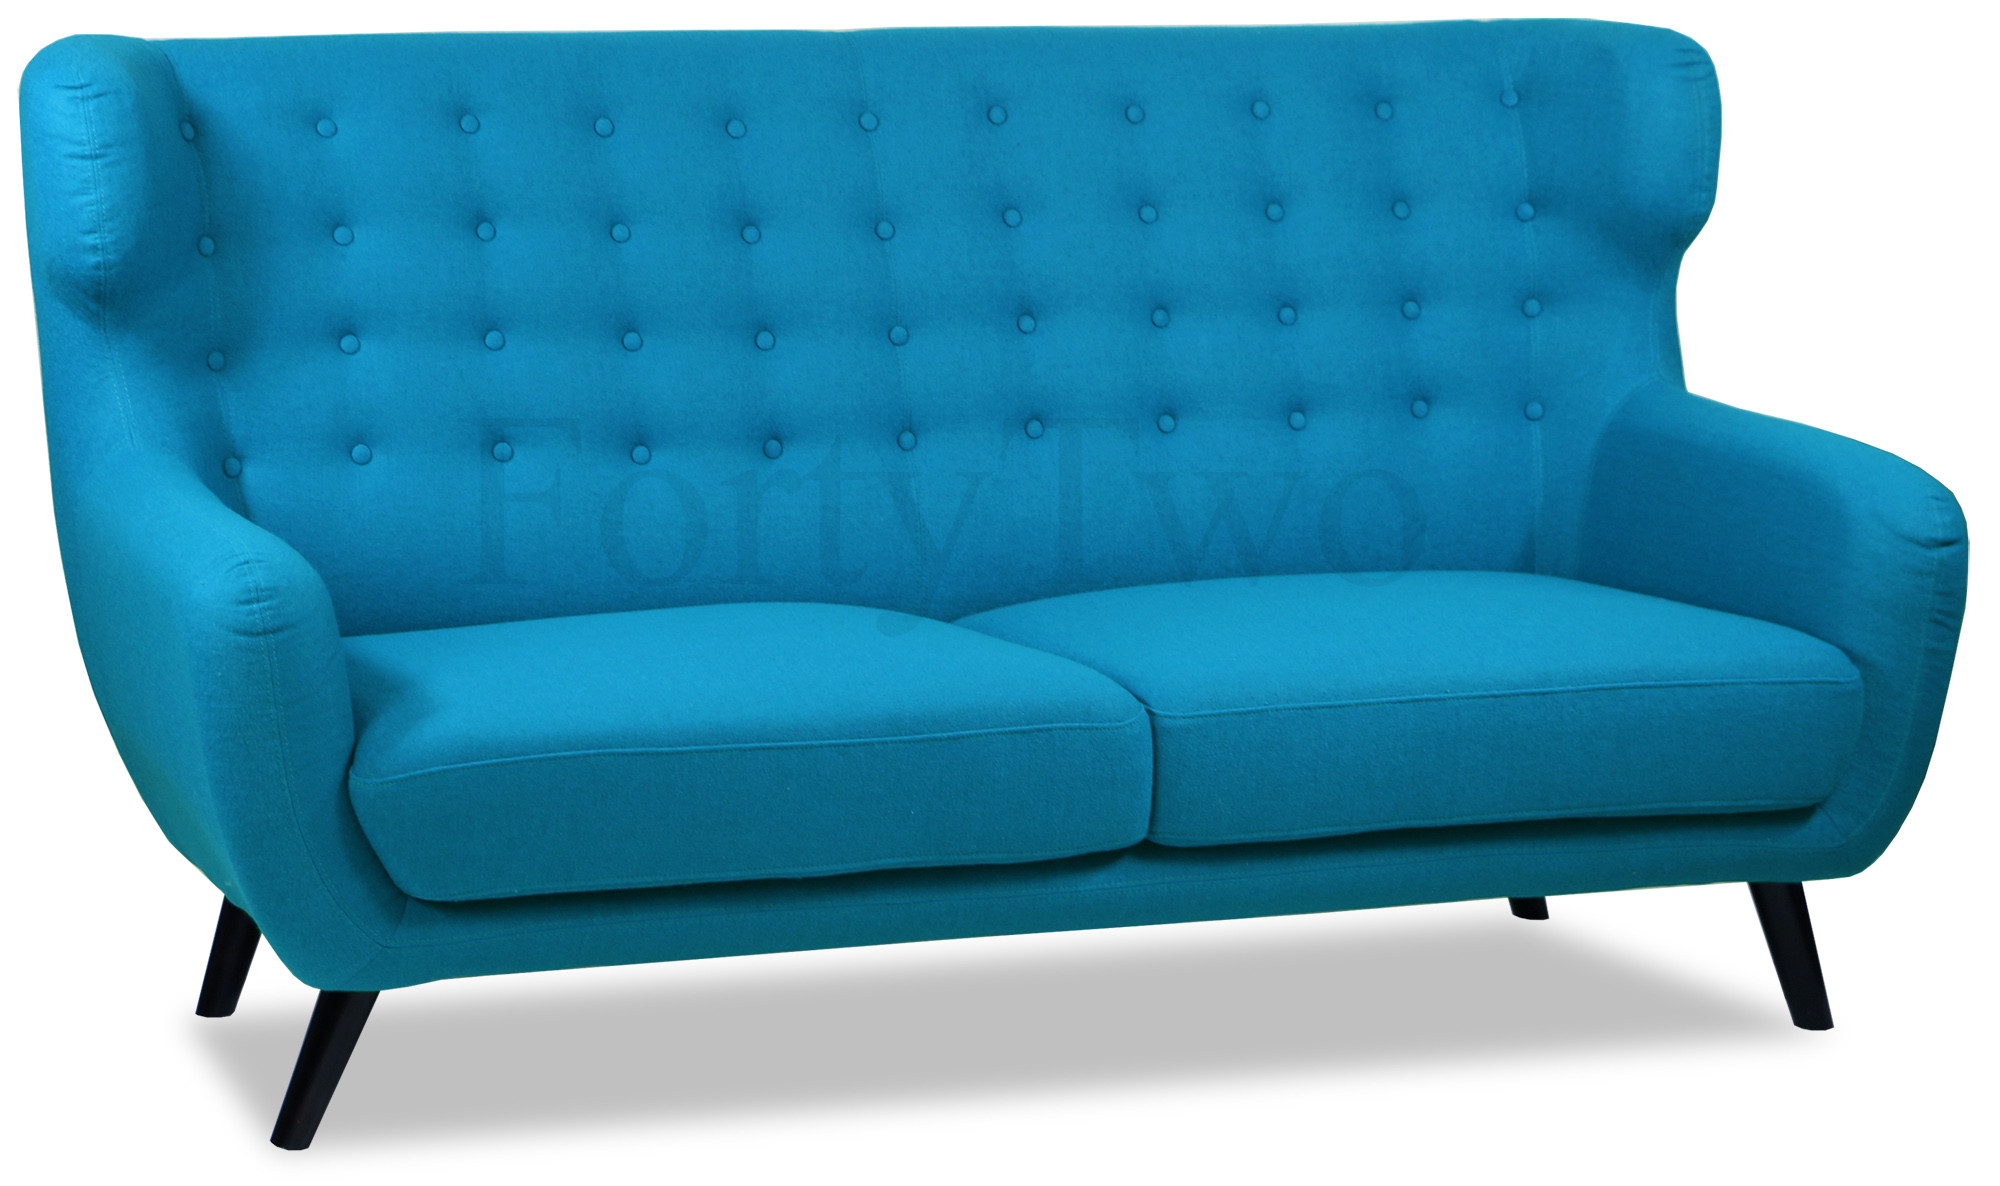 Replica Wingback Designer 3 Seater Sofa In Aqua